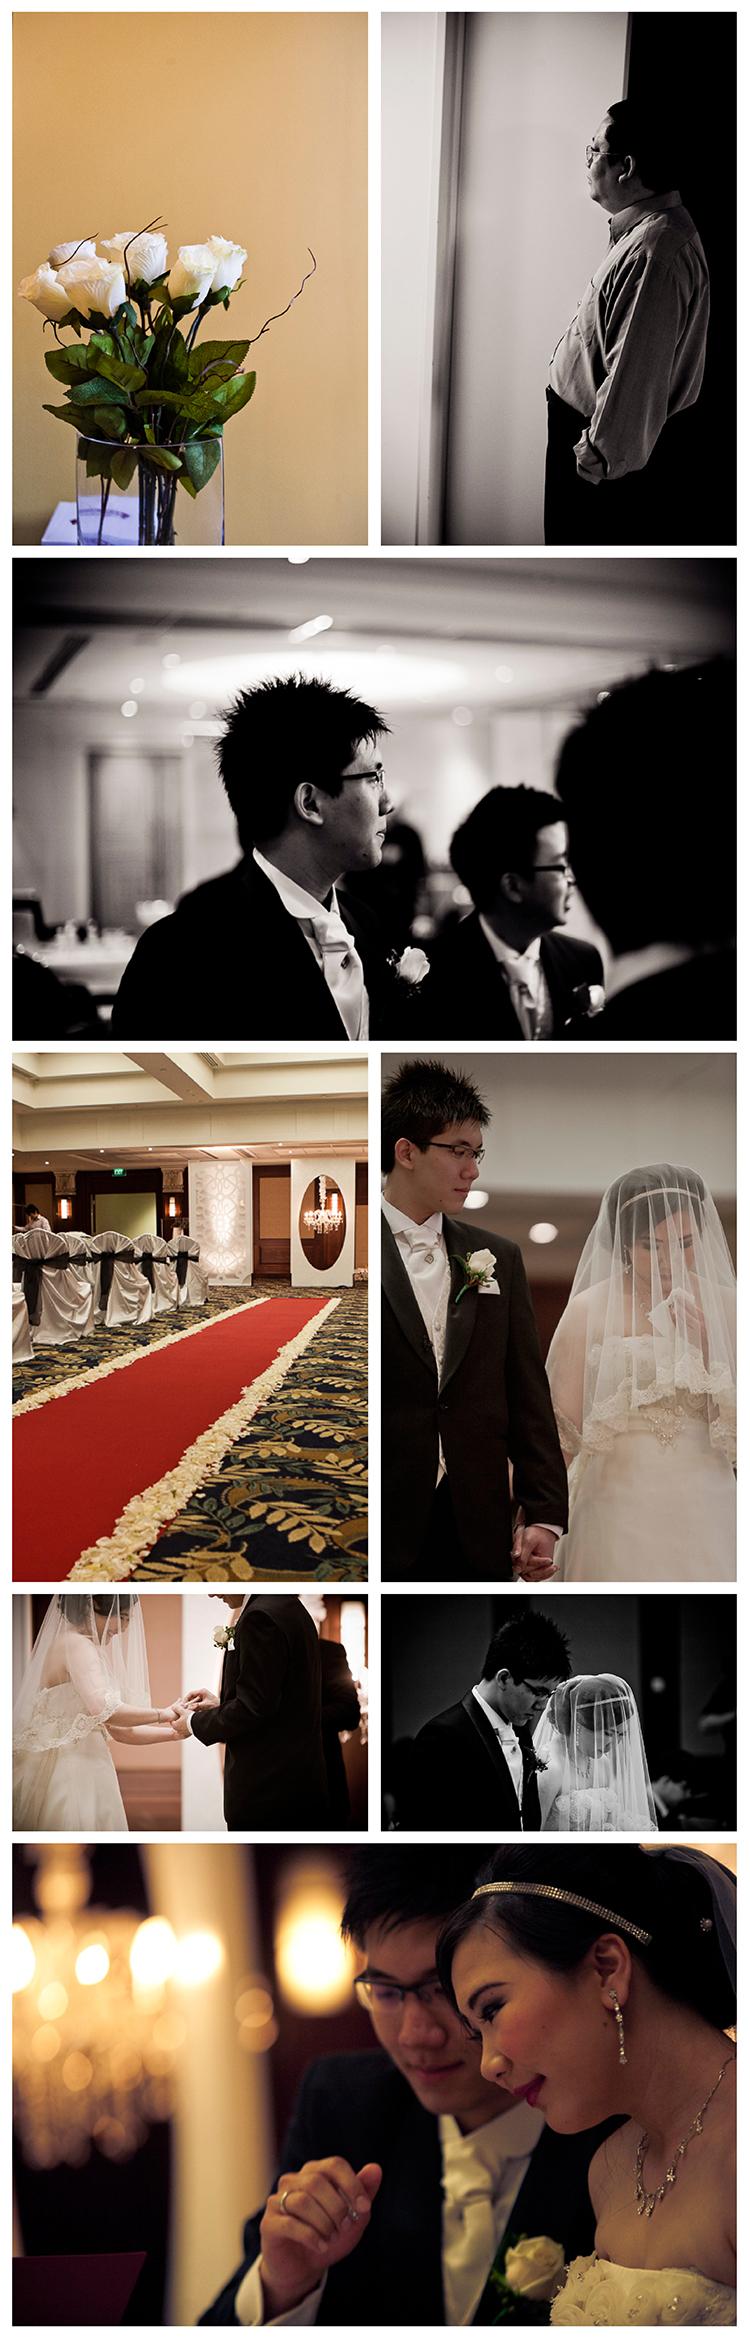 Andry wedding.jpg